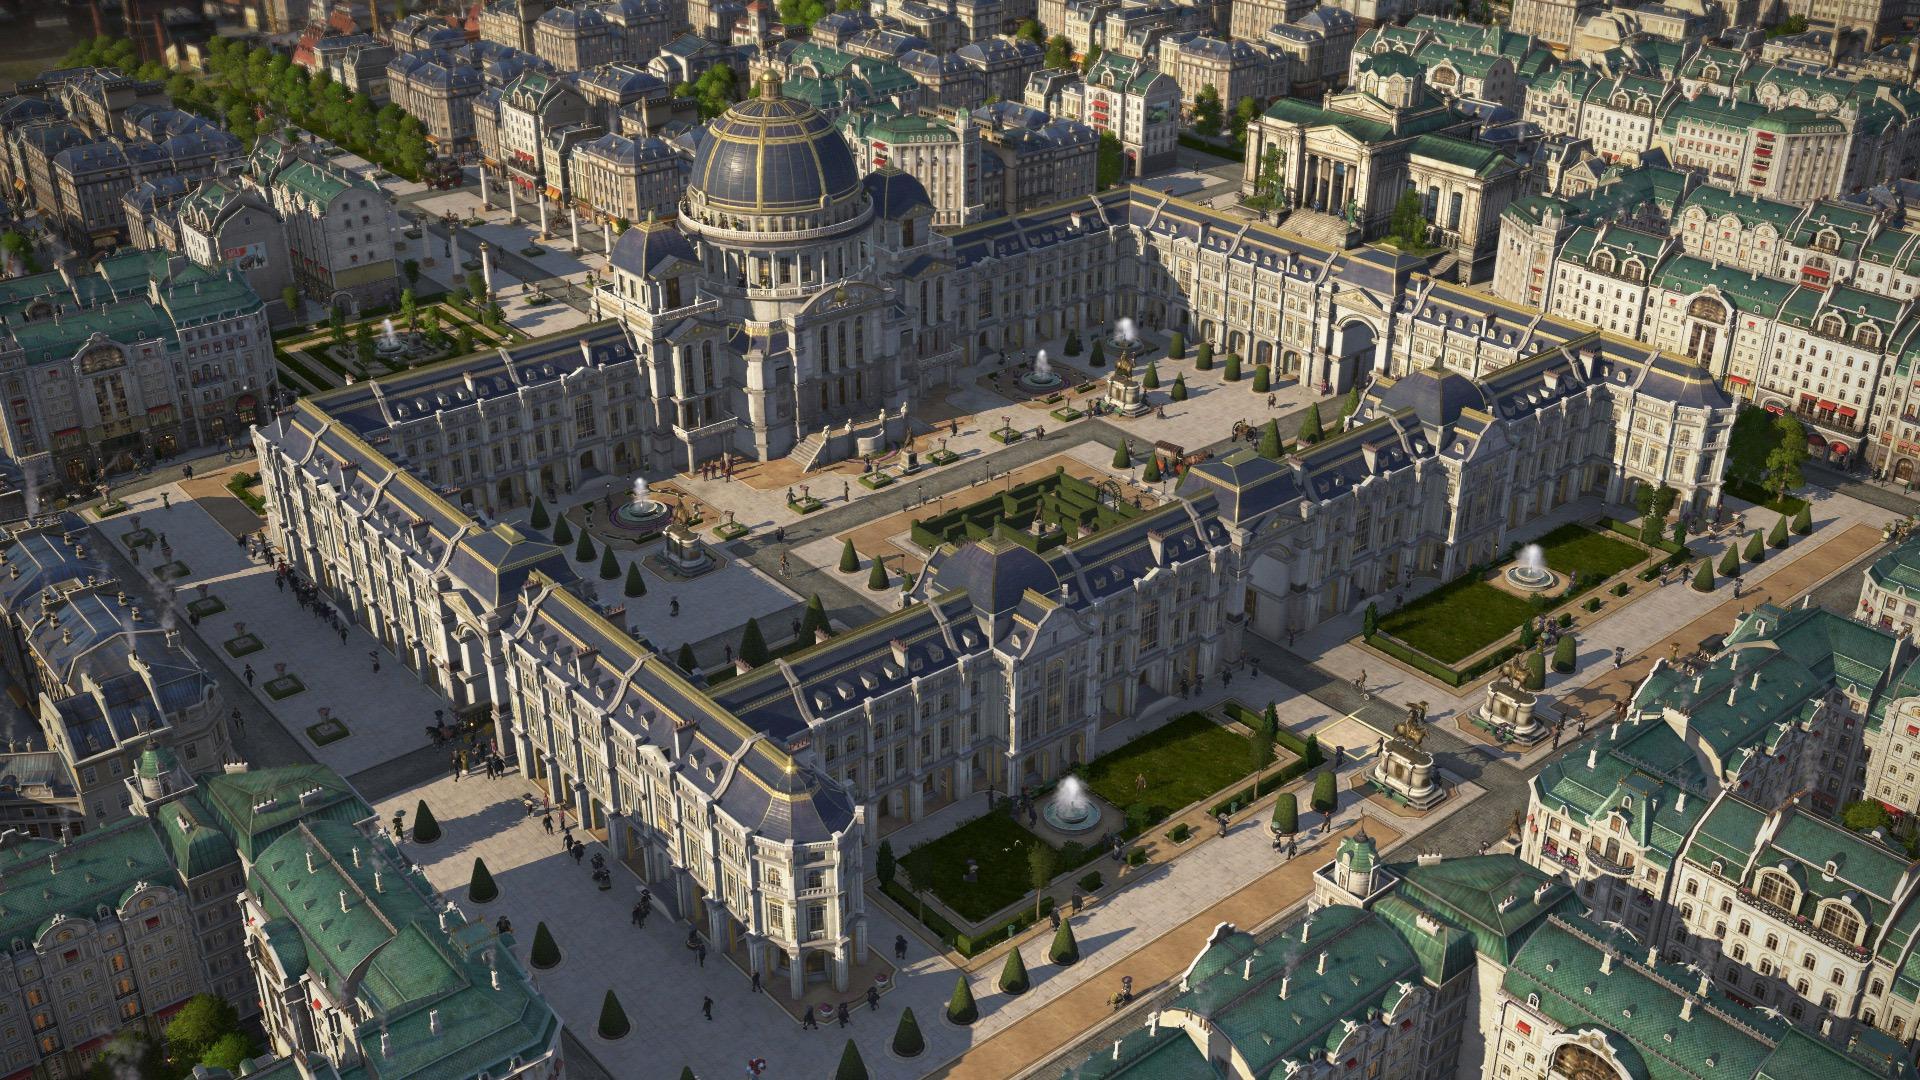 Anno1800_Screenshot_Season2_DLC4_SeatOfPower_Palace-Day_200324_6PM_CET